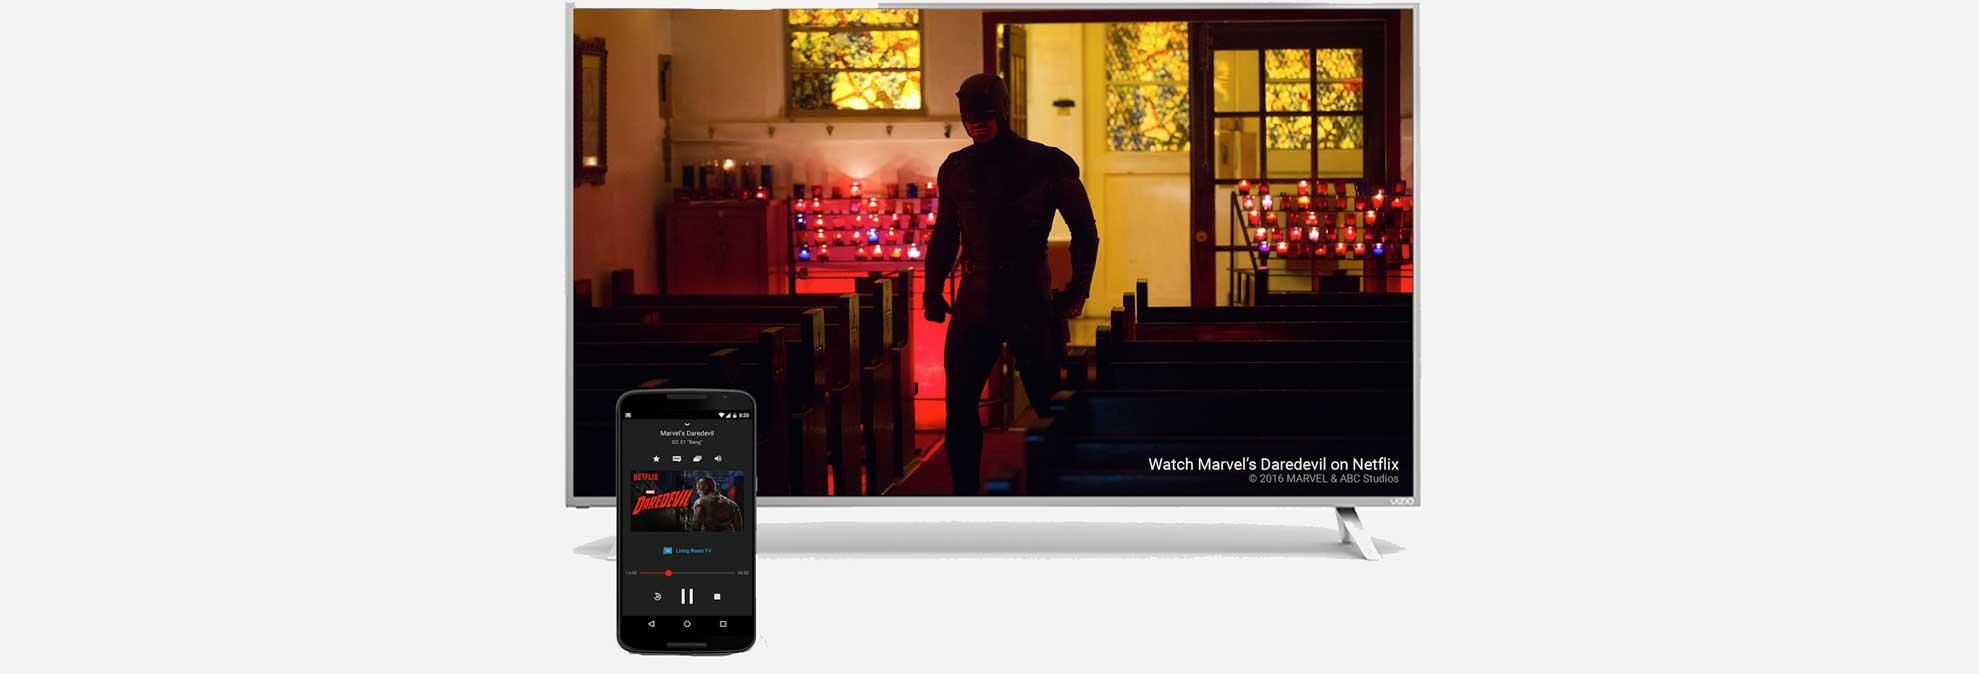 How Google Cast Measures Up as a Smart TV Platform - Consumer Reports